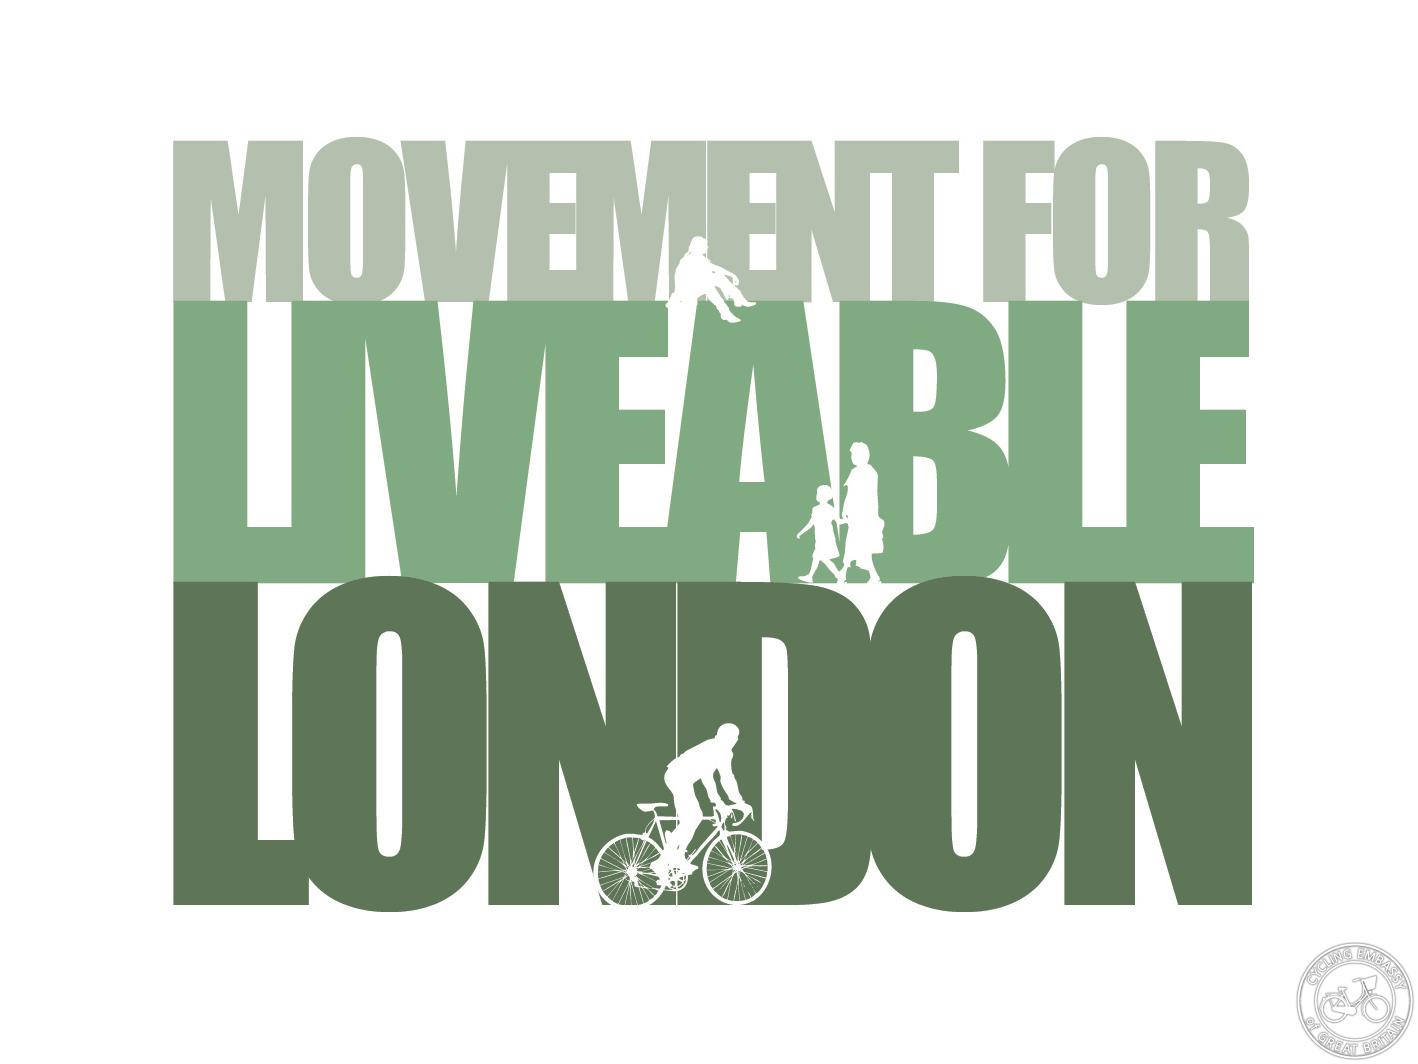 Movement for Liveable London logo